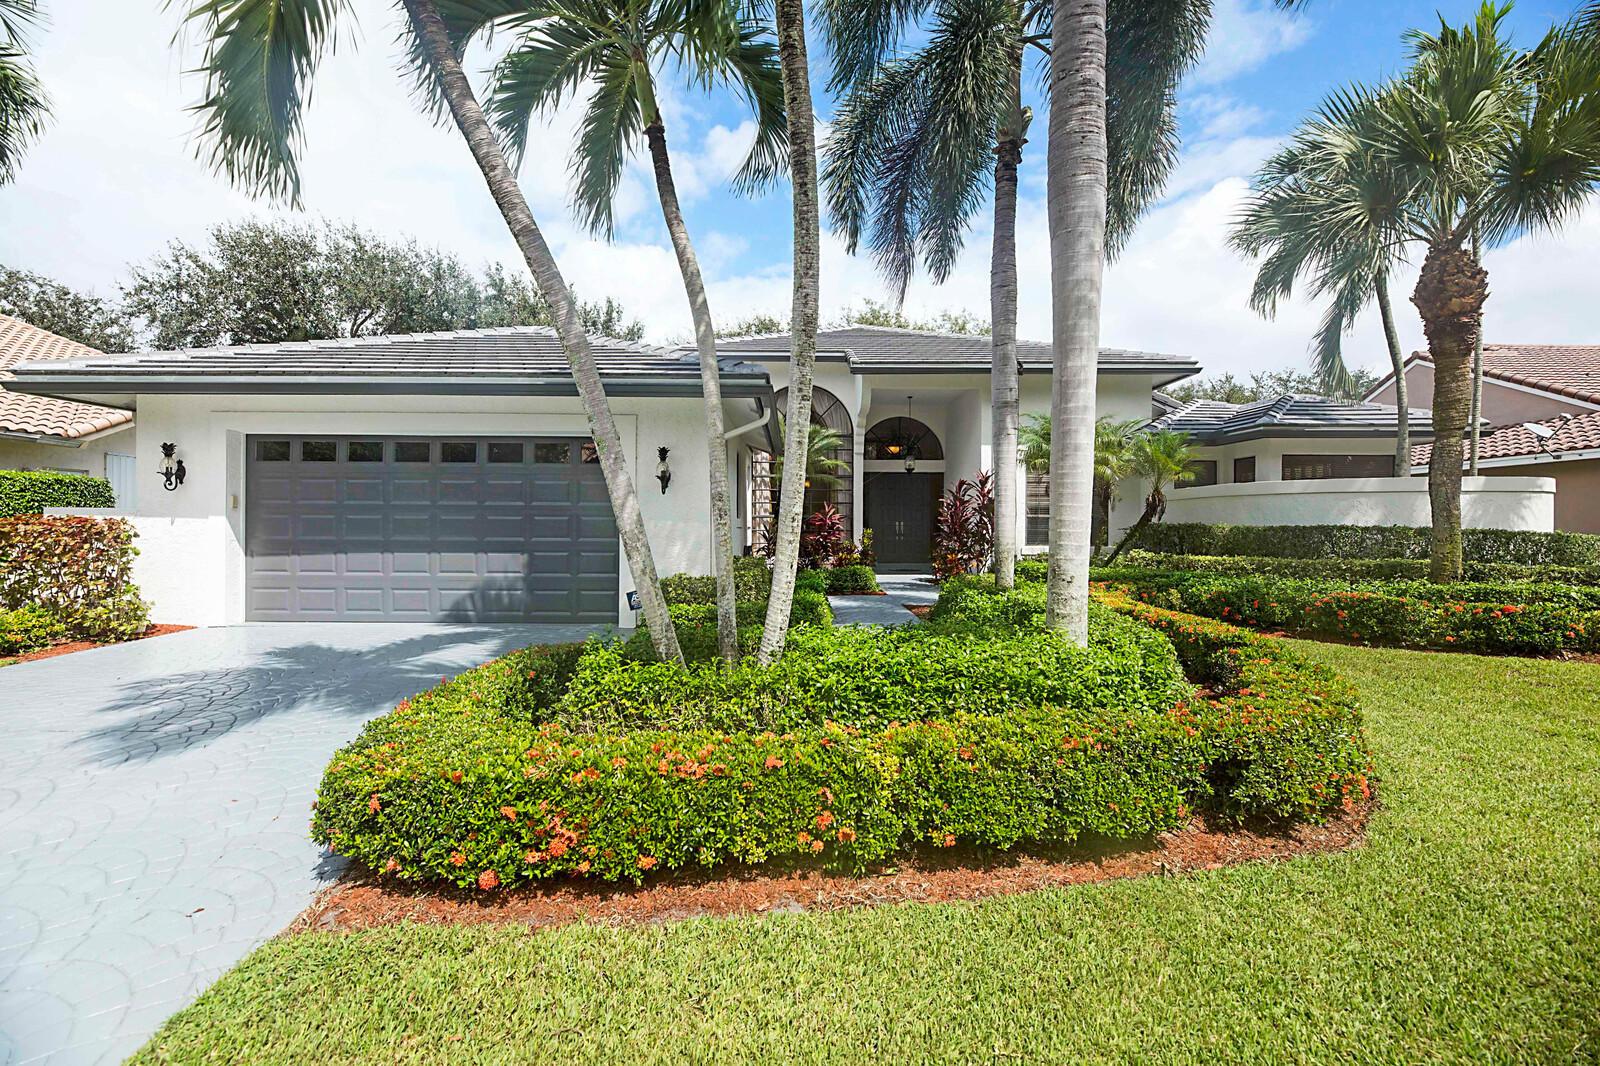 Home for sale in Glen Oaks Boca Raton Florida